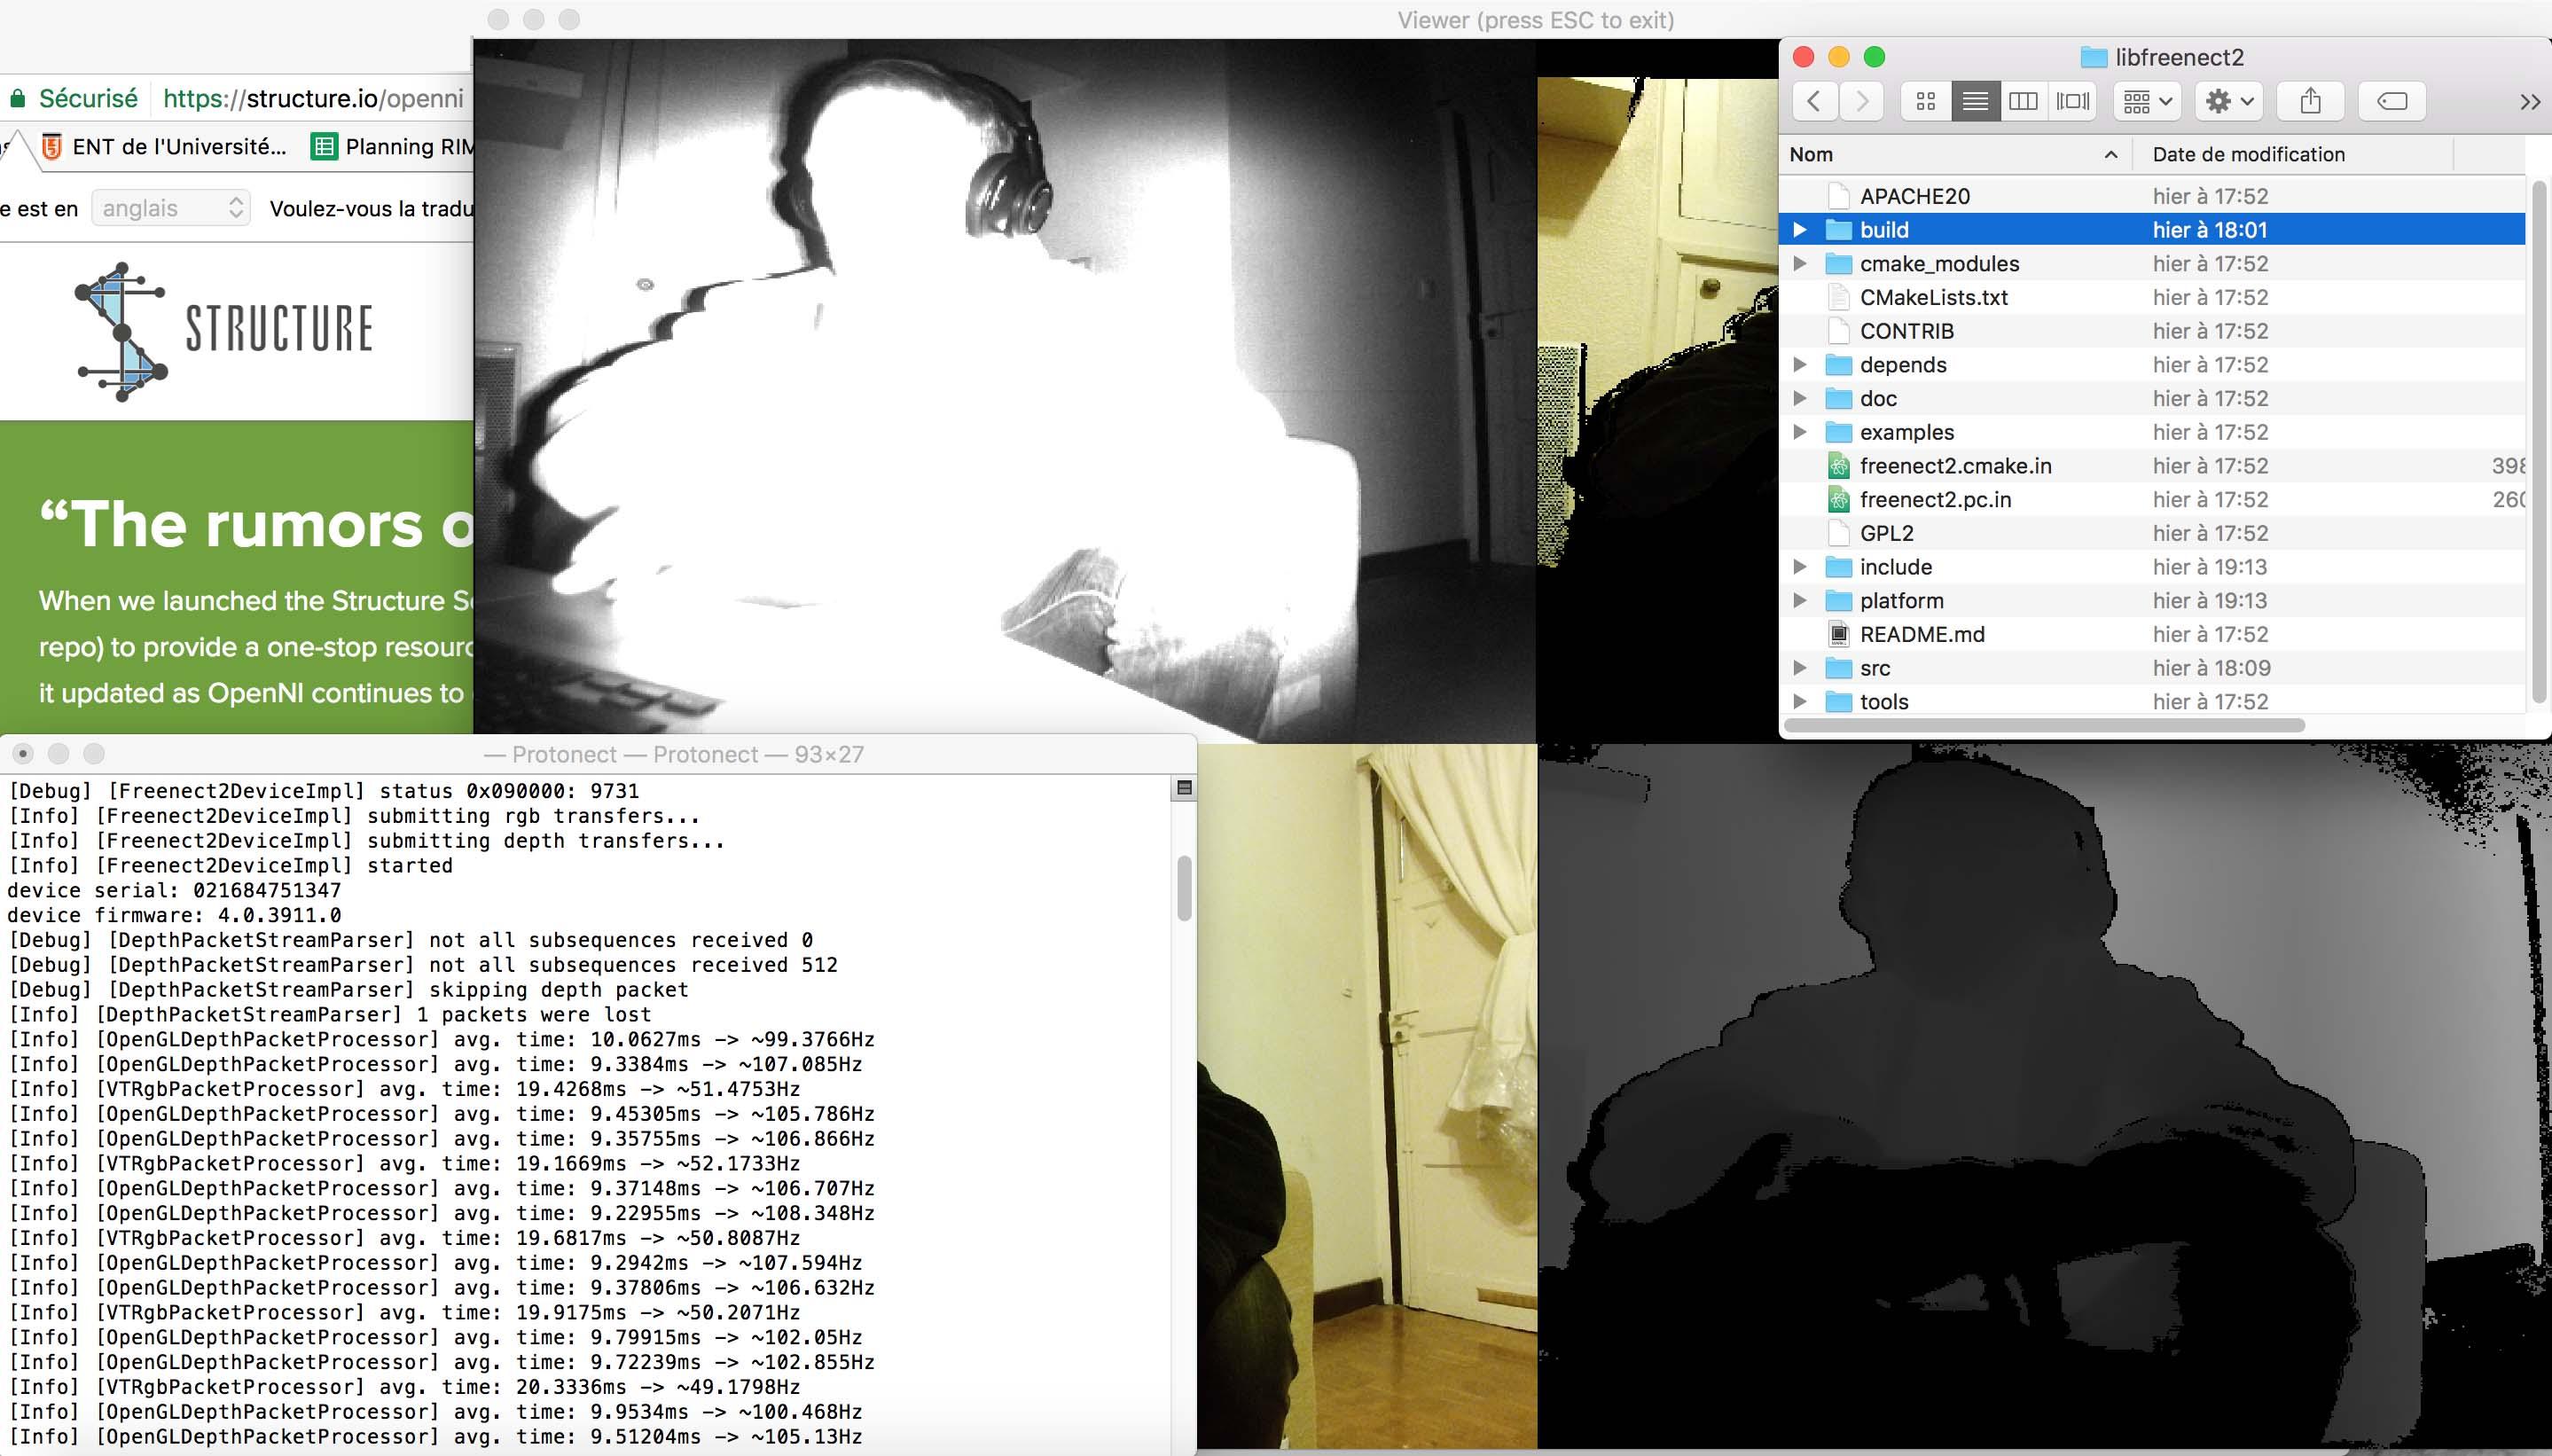 MAC / Kinect v2 + OpenNI 2 SDK + OpenKinect/libfreenect2 - MaxMSP